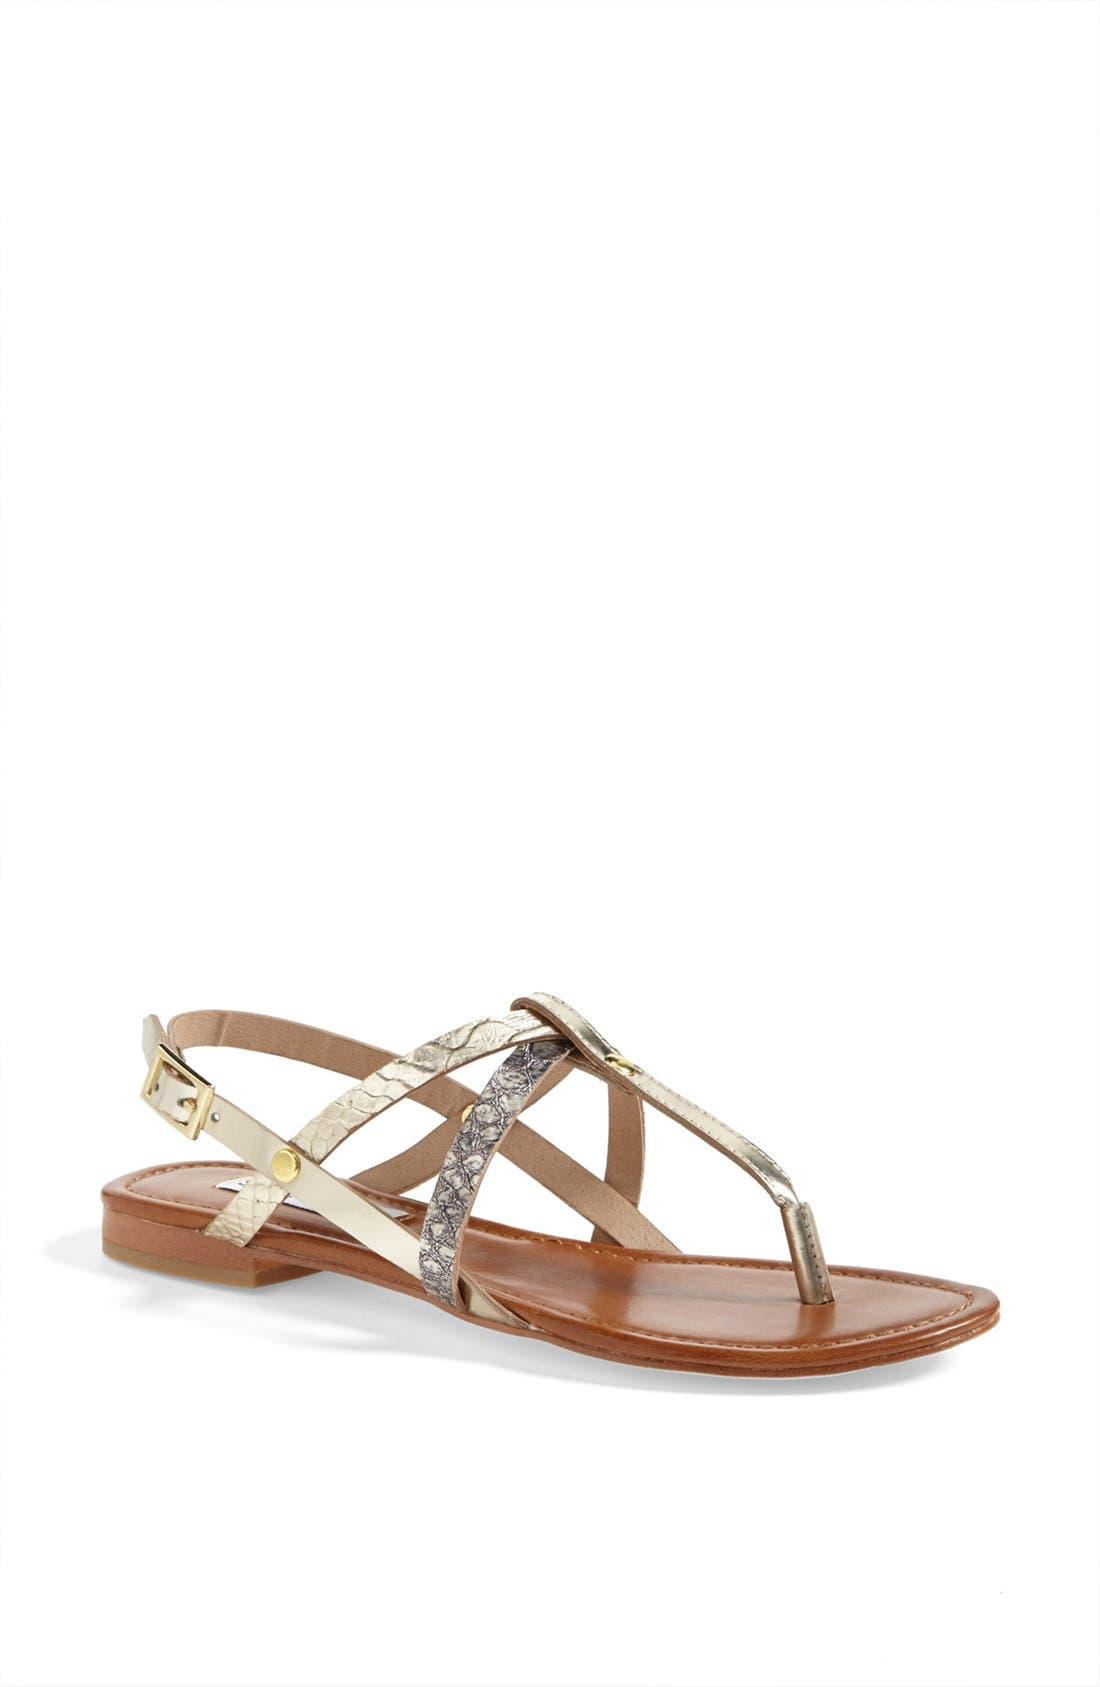 Alternate Image 1 Selected - Steve Madden 'Kroatia' Leather Sandal